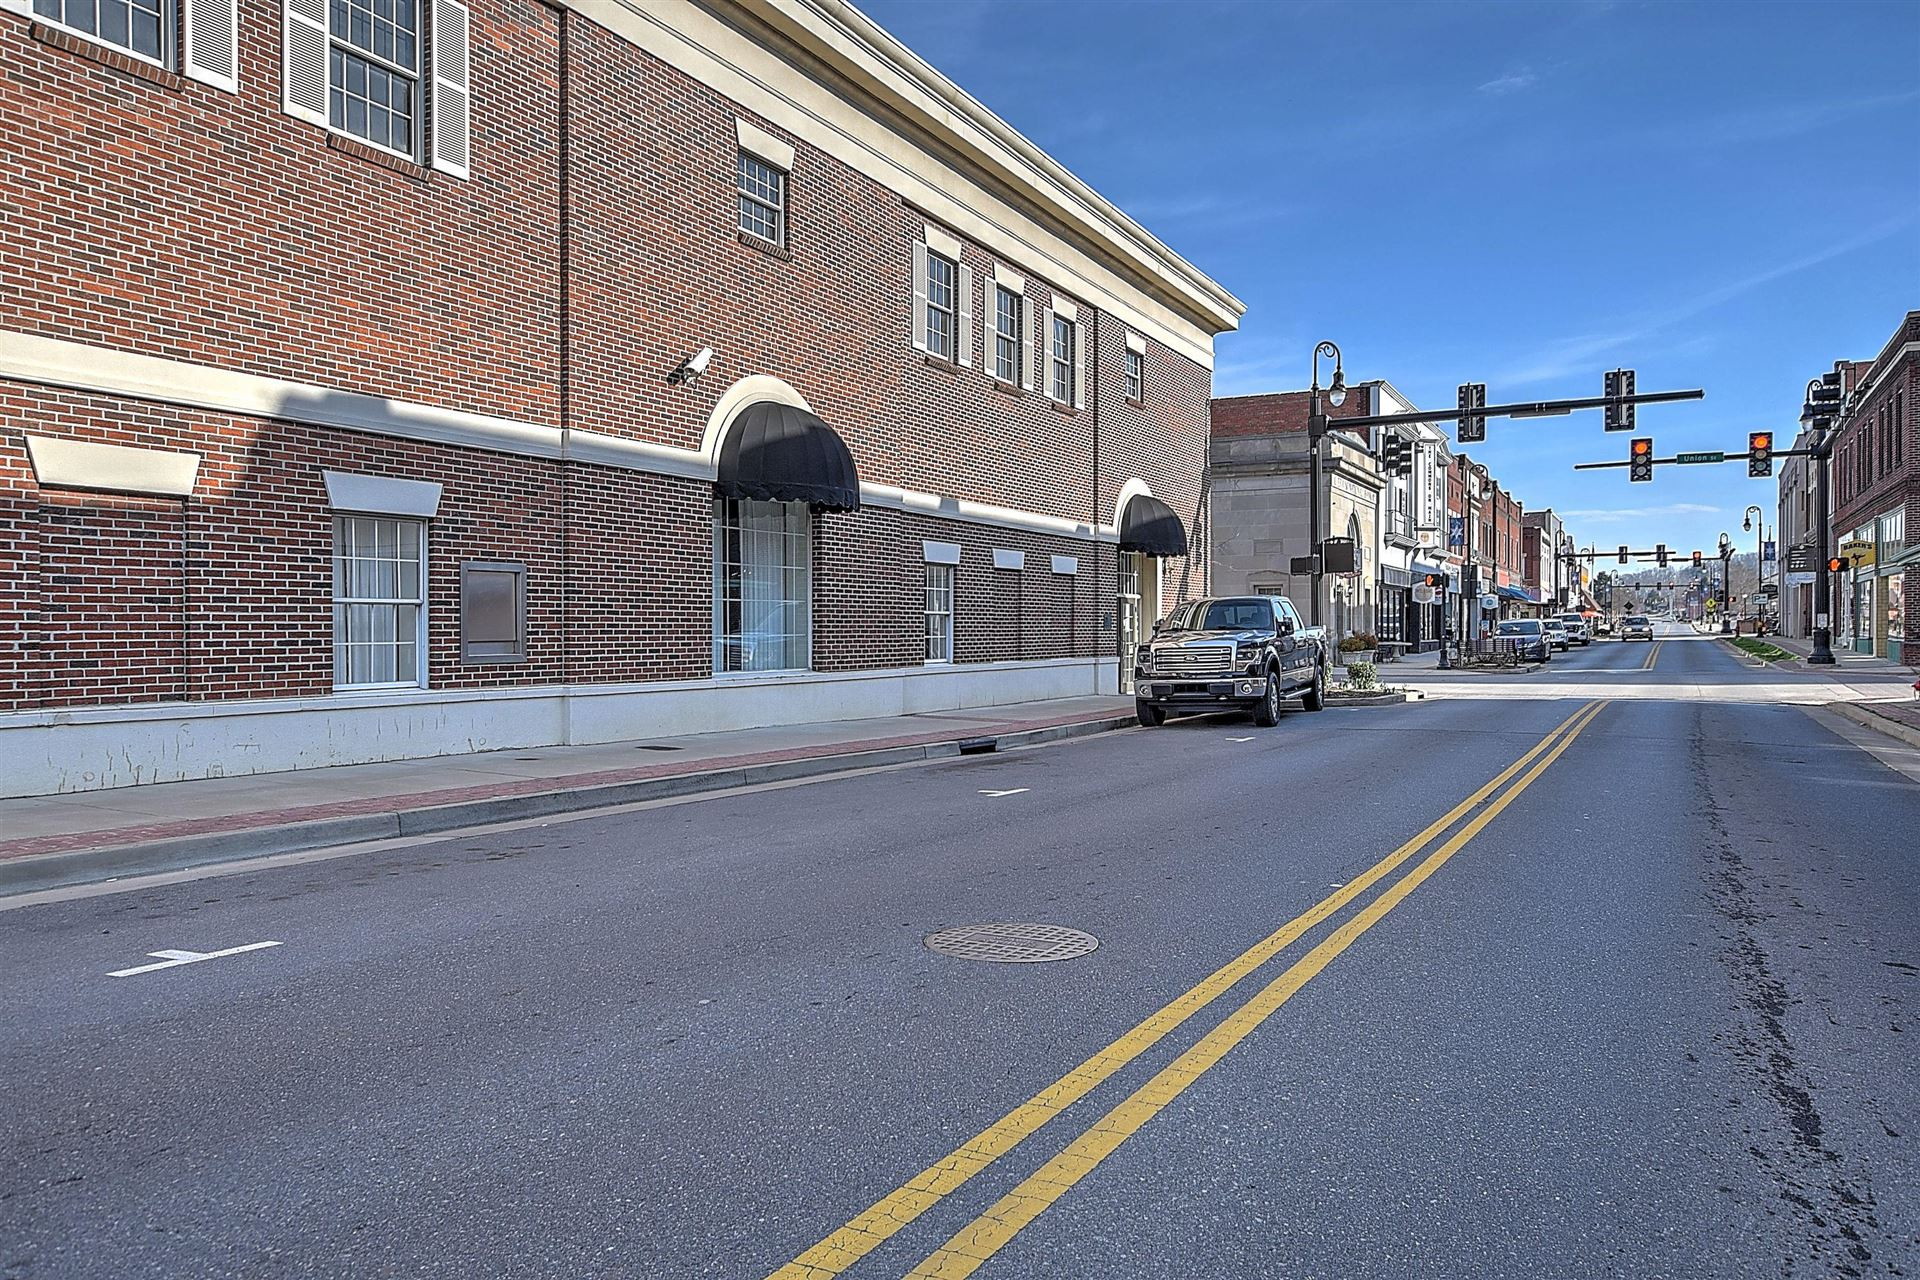 Photo of 201 South Main Avenue, Erwin, TN 37650 (MLS # 9919466)